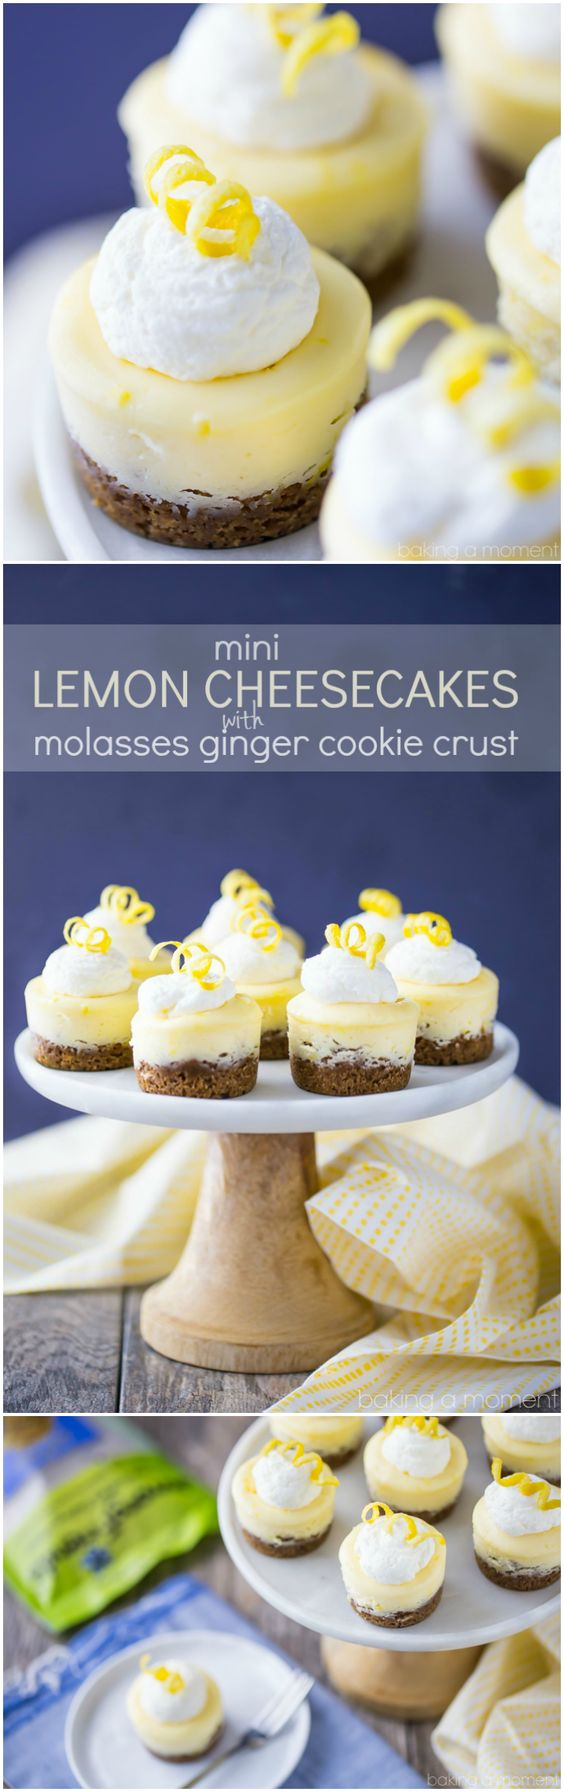 Lemon cheesecake, Cheesecake and Lemon on Pinterest